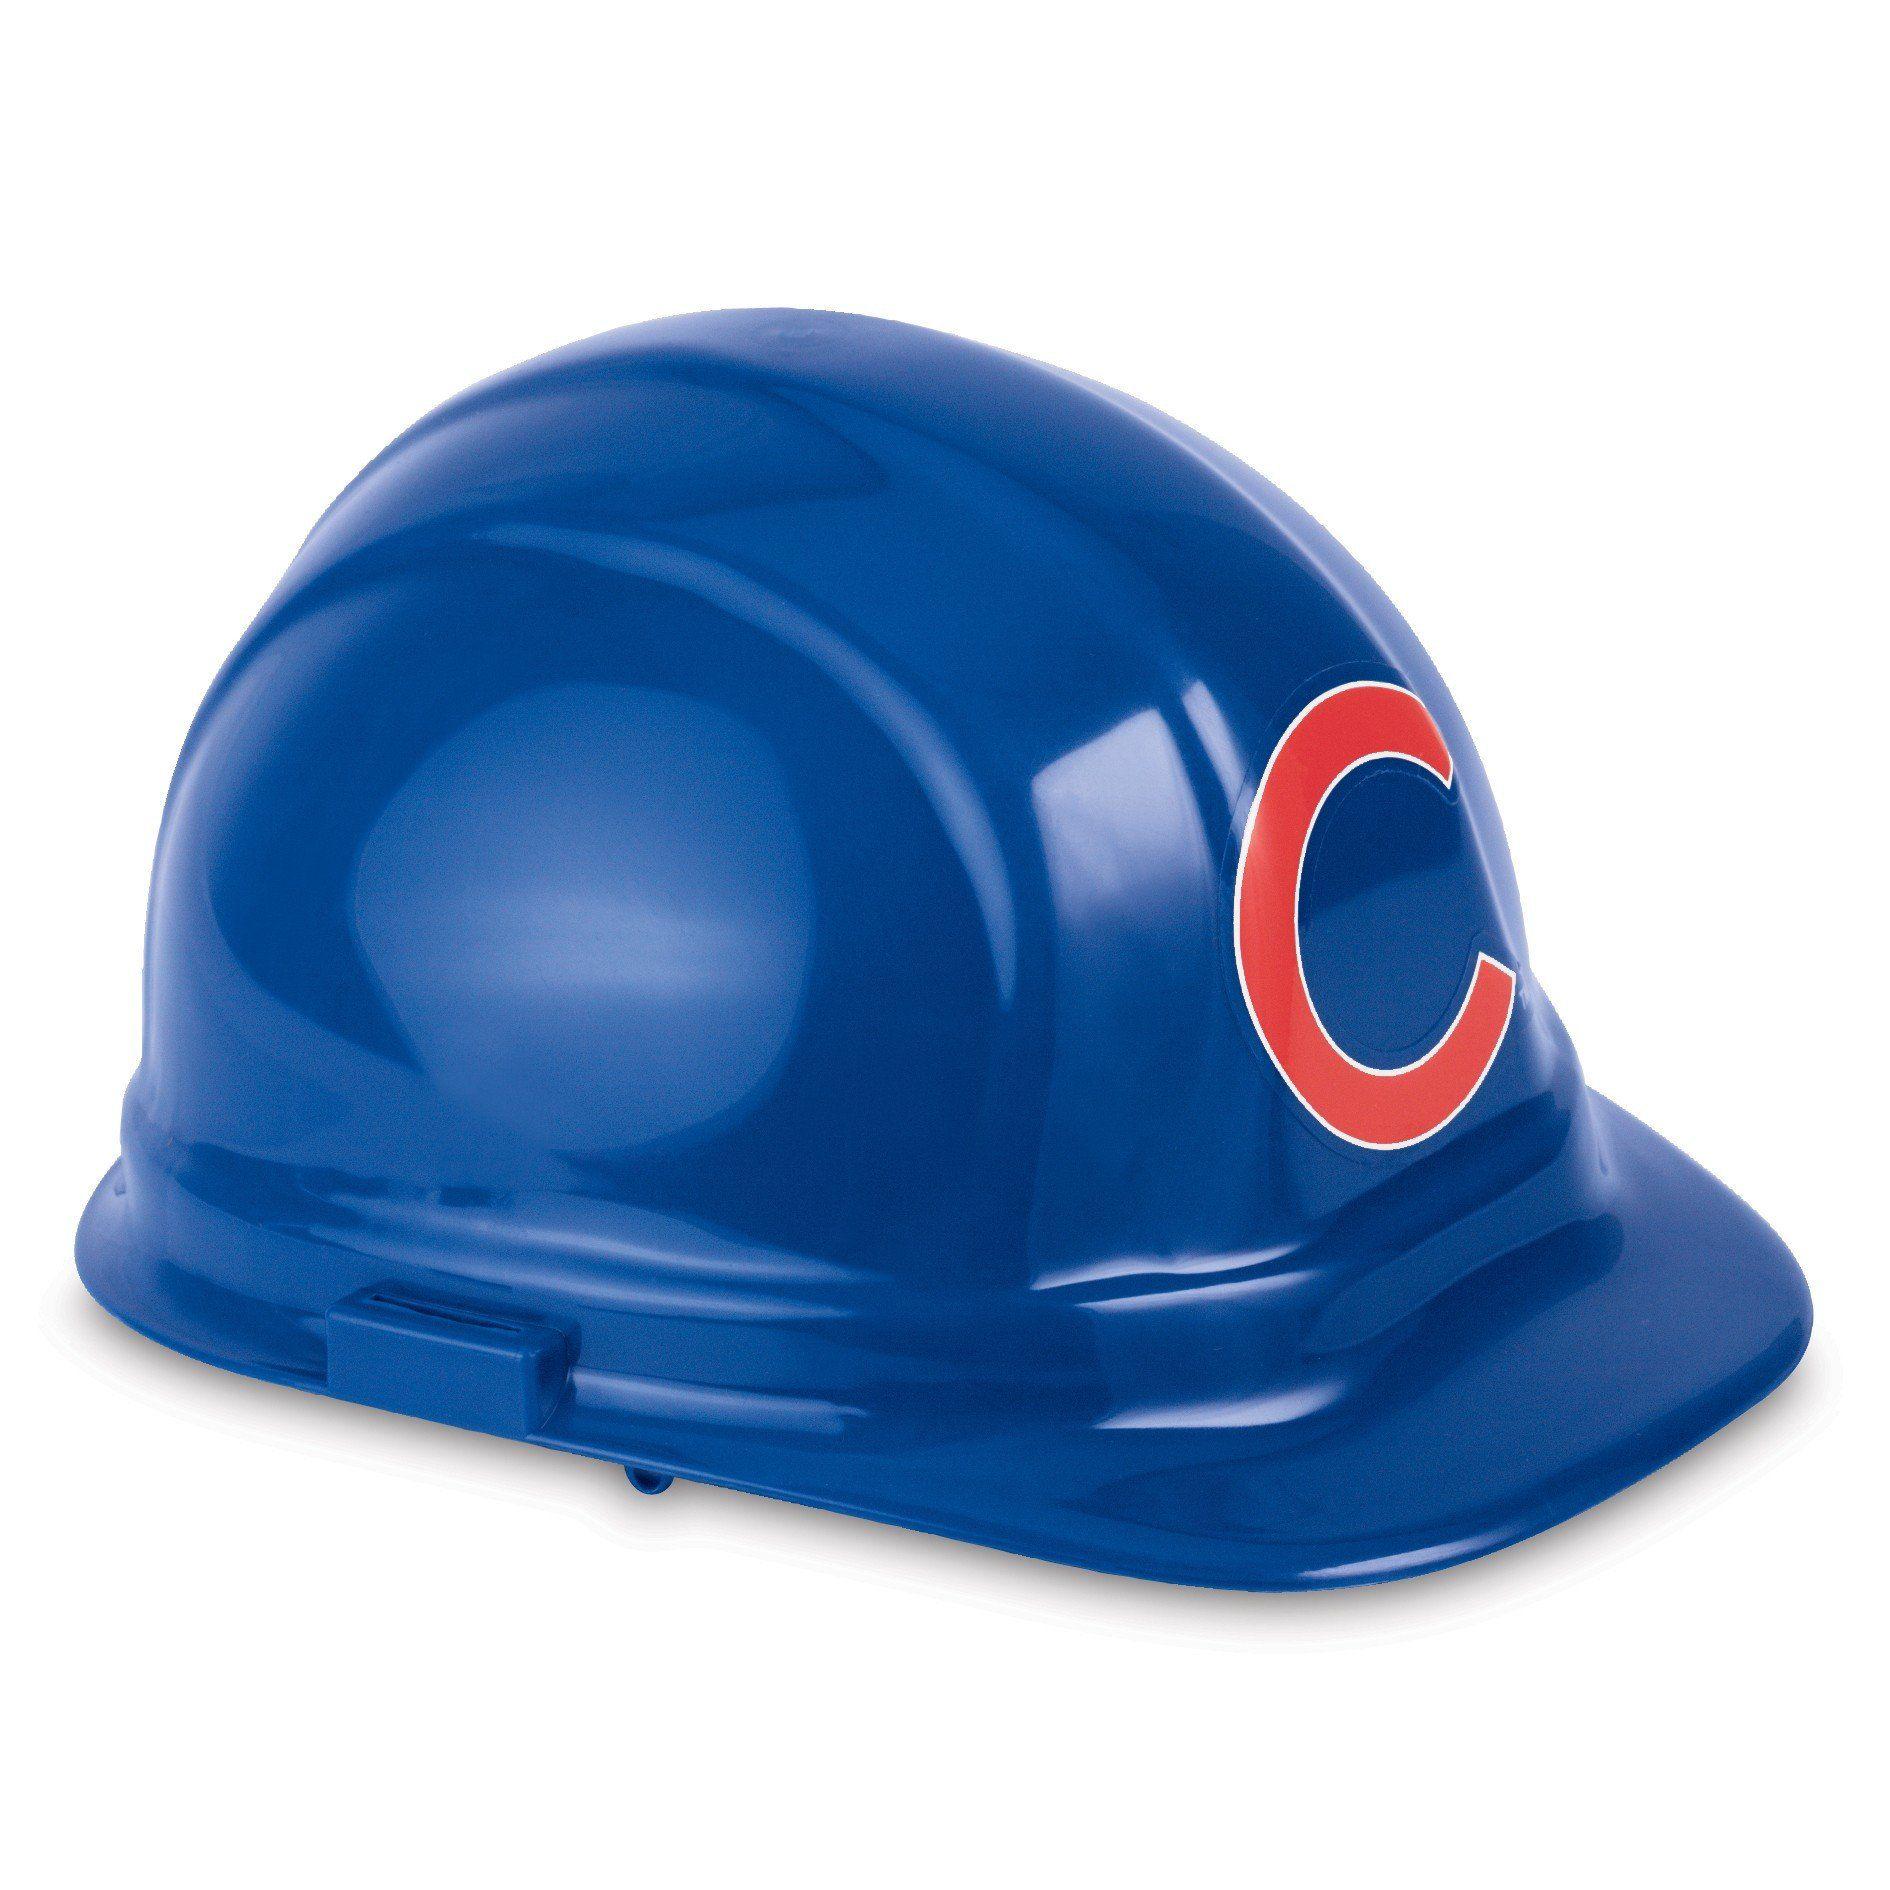 Chicago Cubs hard hat Cubs Merchandise 5bdc1293fc1